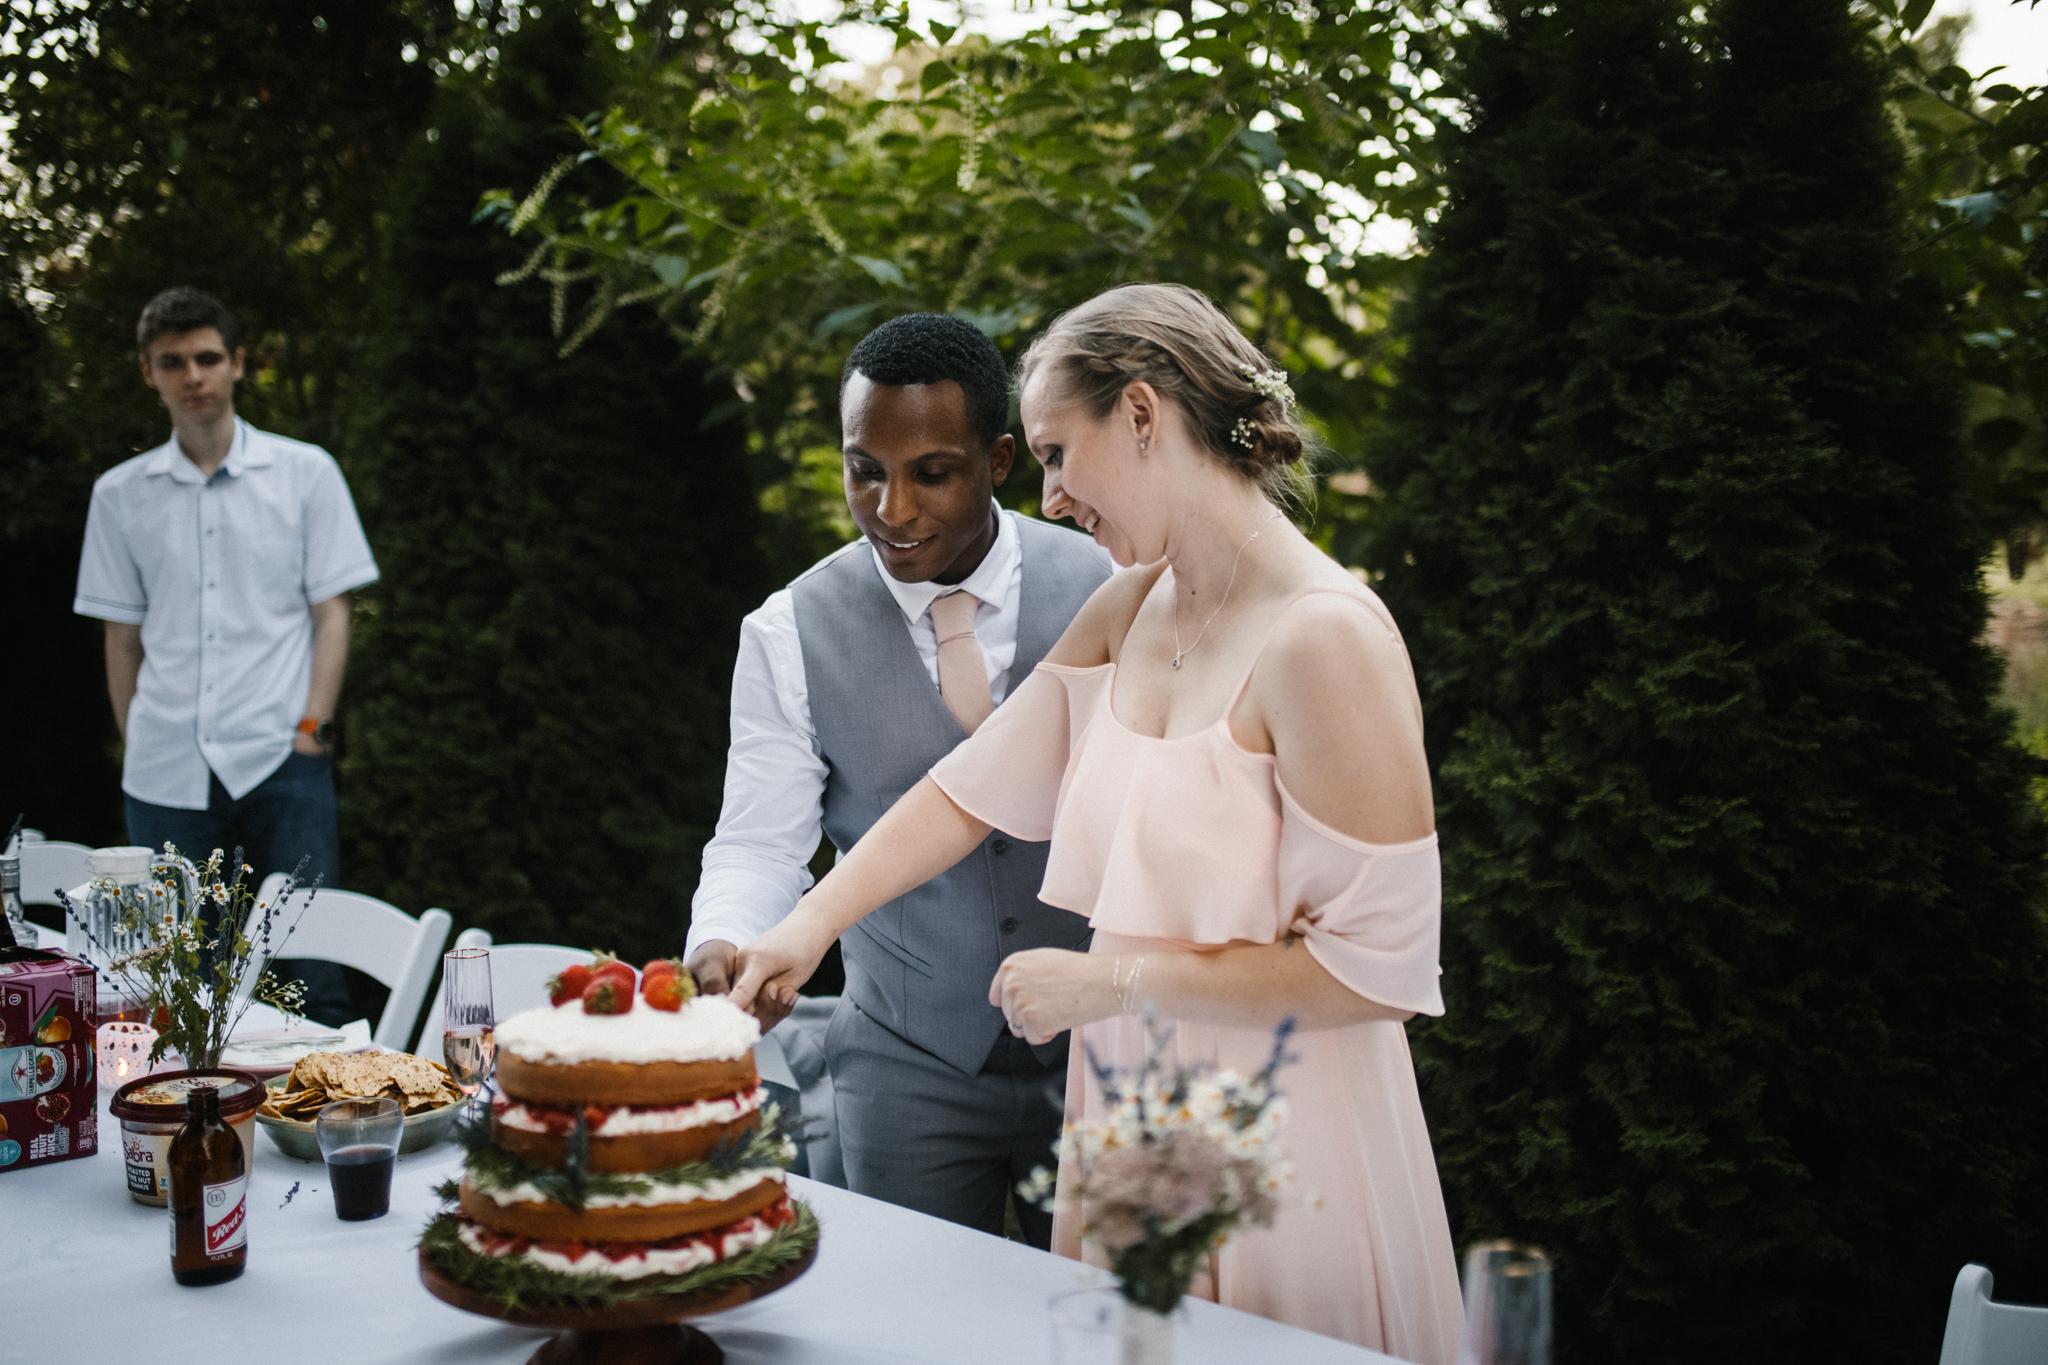 dorota_dwight_richmond_backyard_wedding-102.jpg